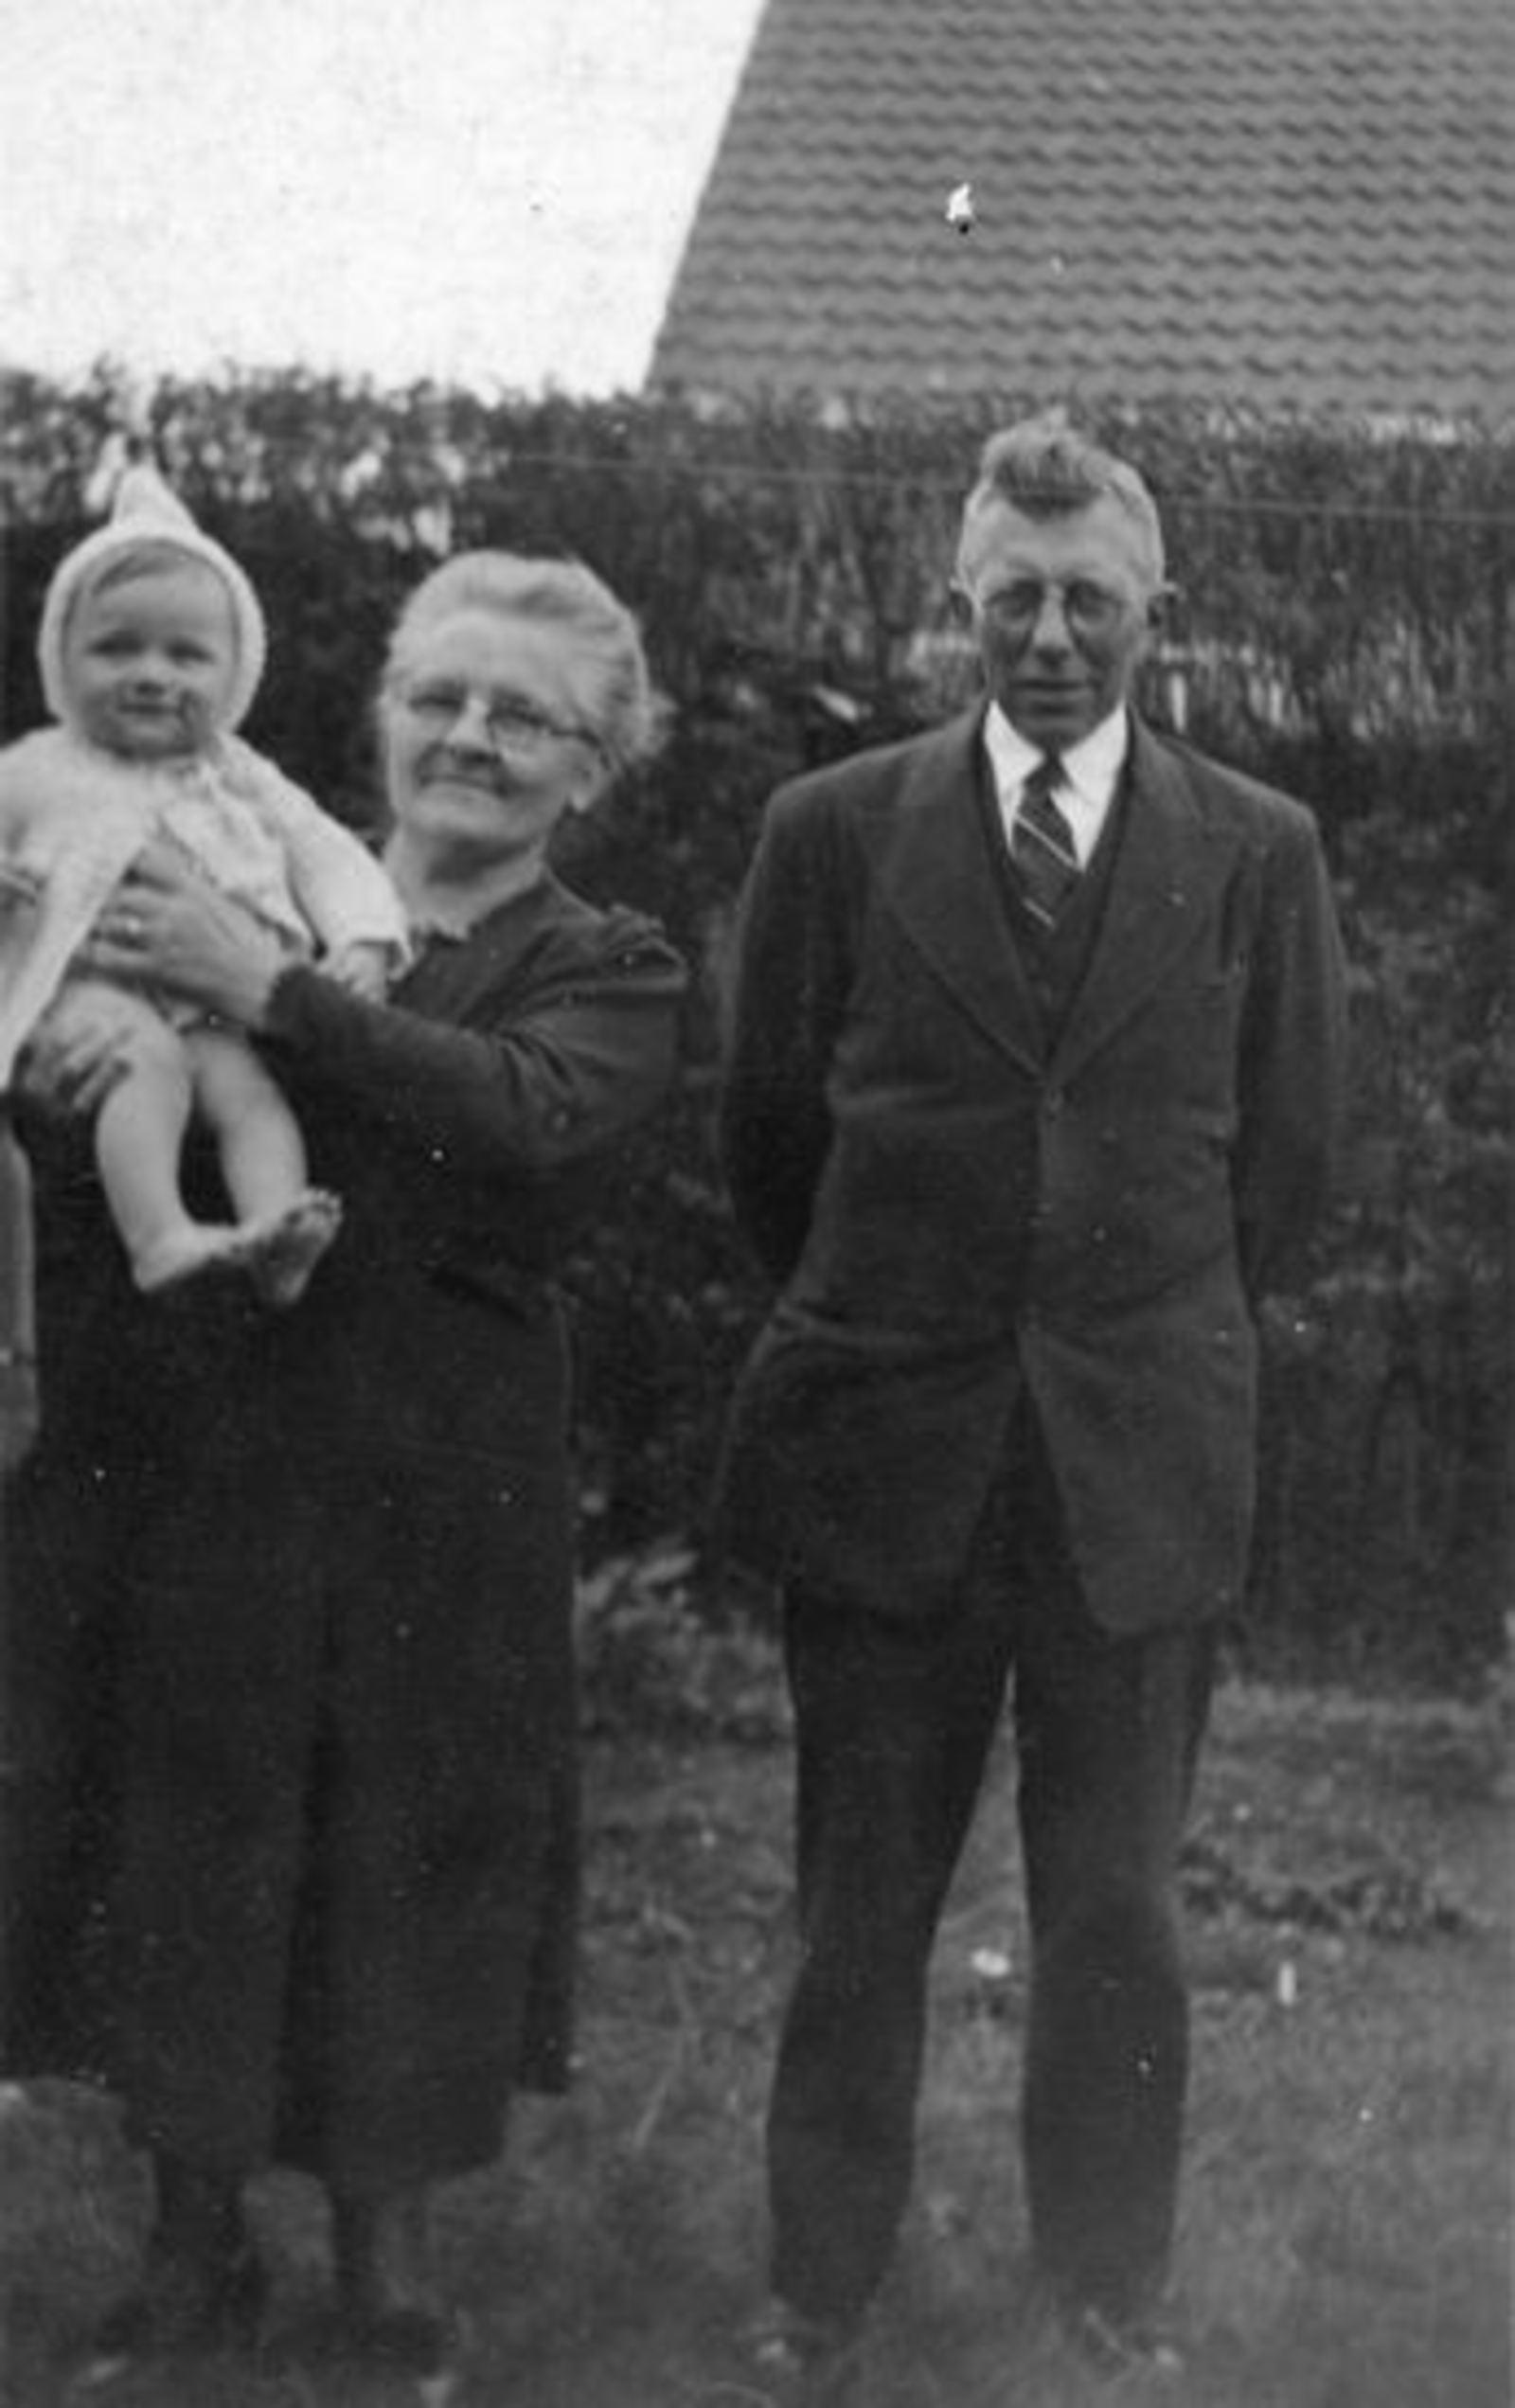 Sluis Jan 1878 19__ met vrouw Pietertje v Voorst en Onbekende Baby